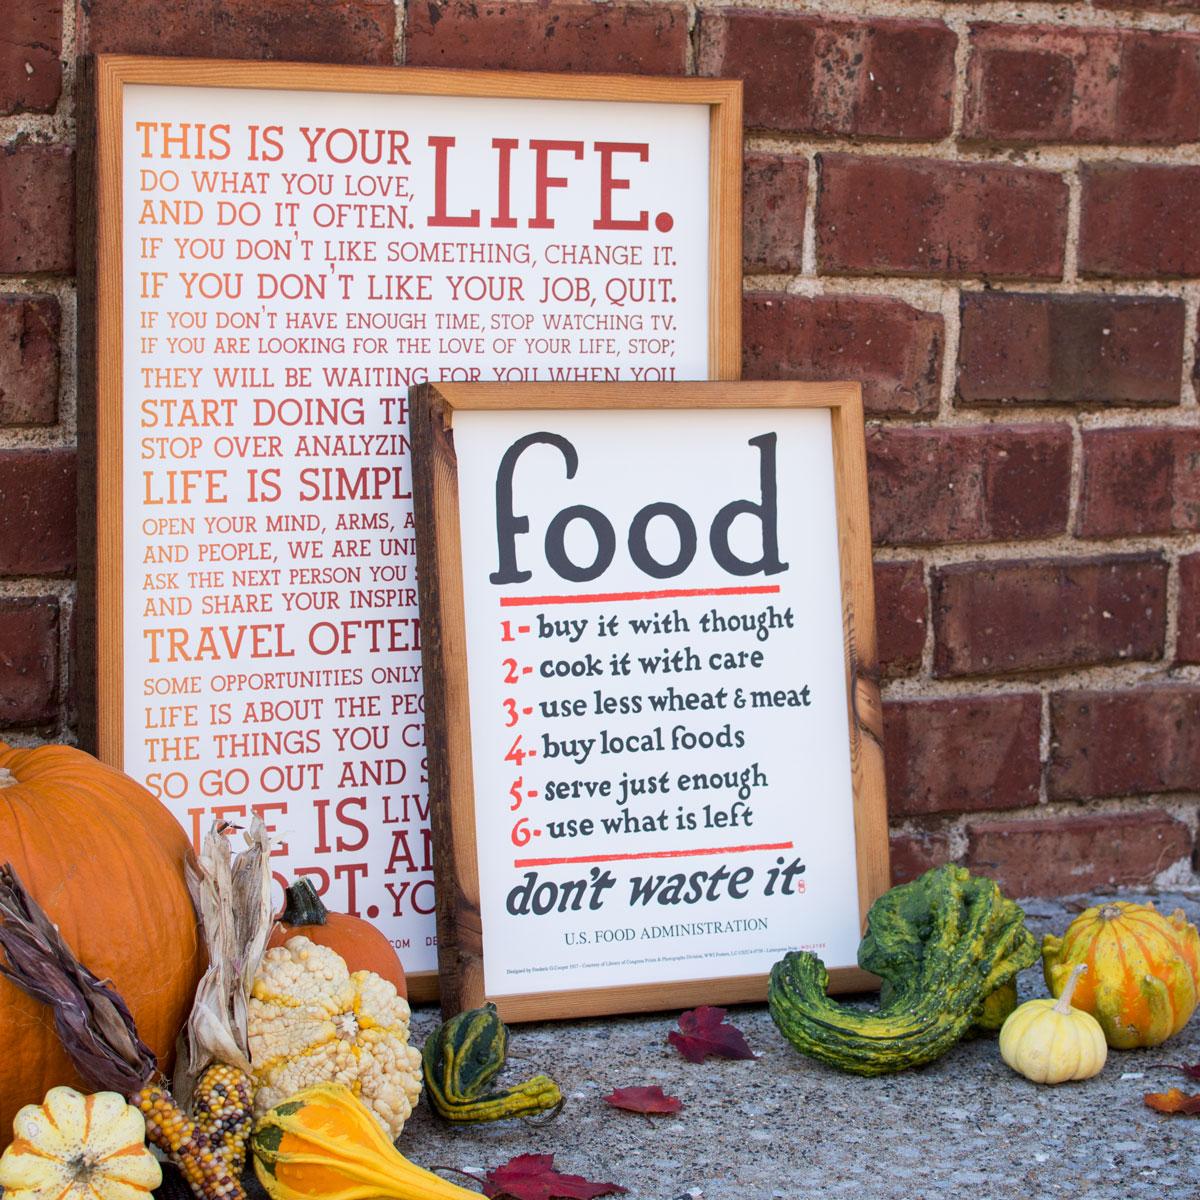 lg-food-rules-sunset-manifesto-right-align-brick-1200px.jpg